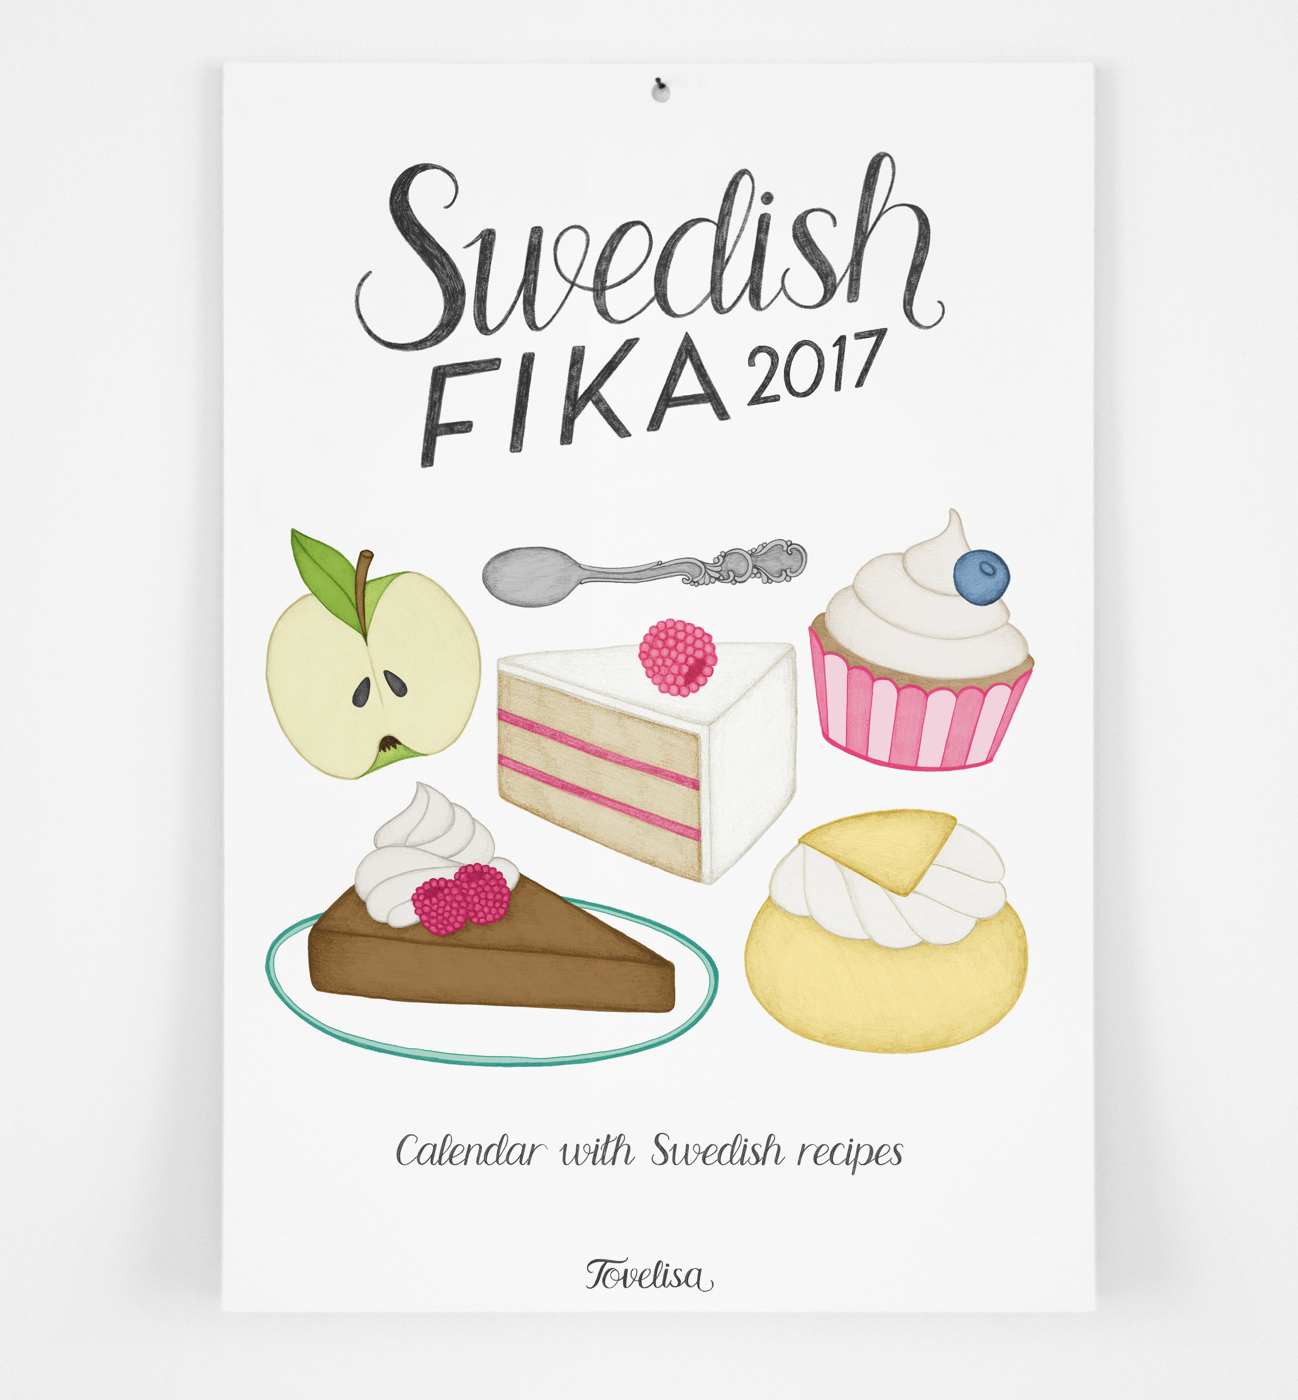 swedish_fika